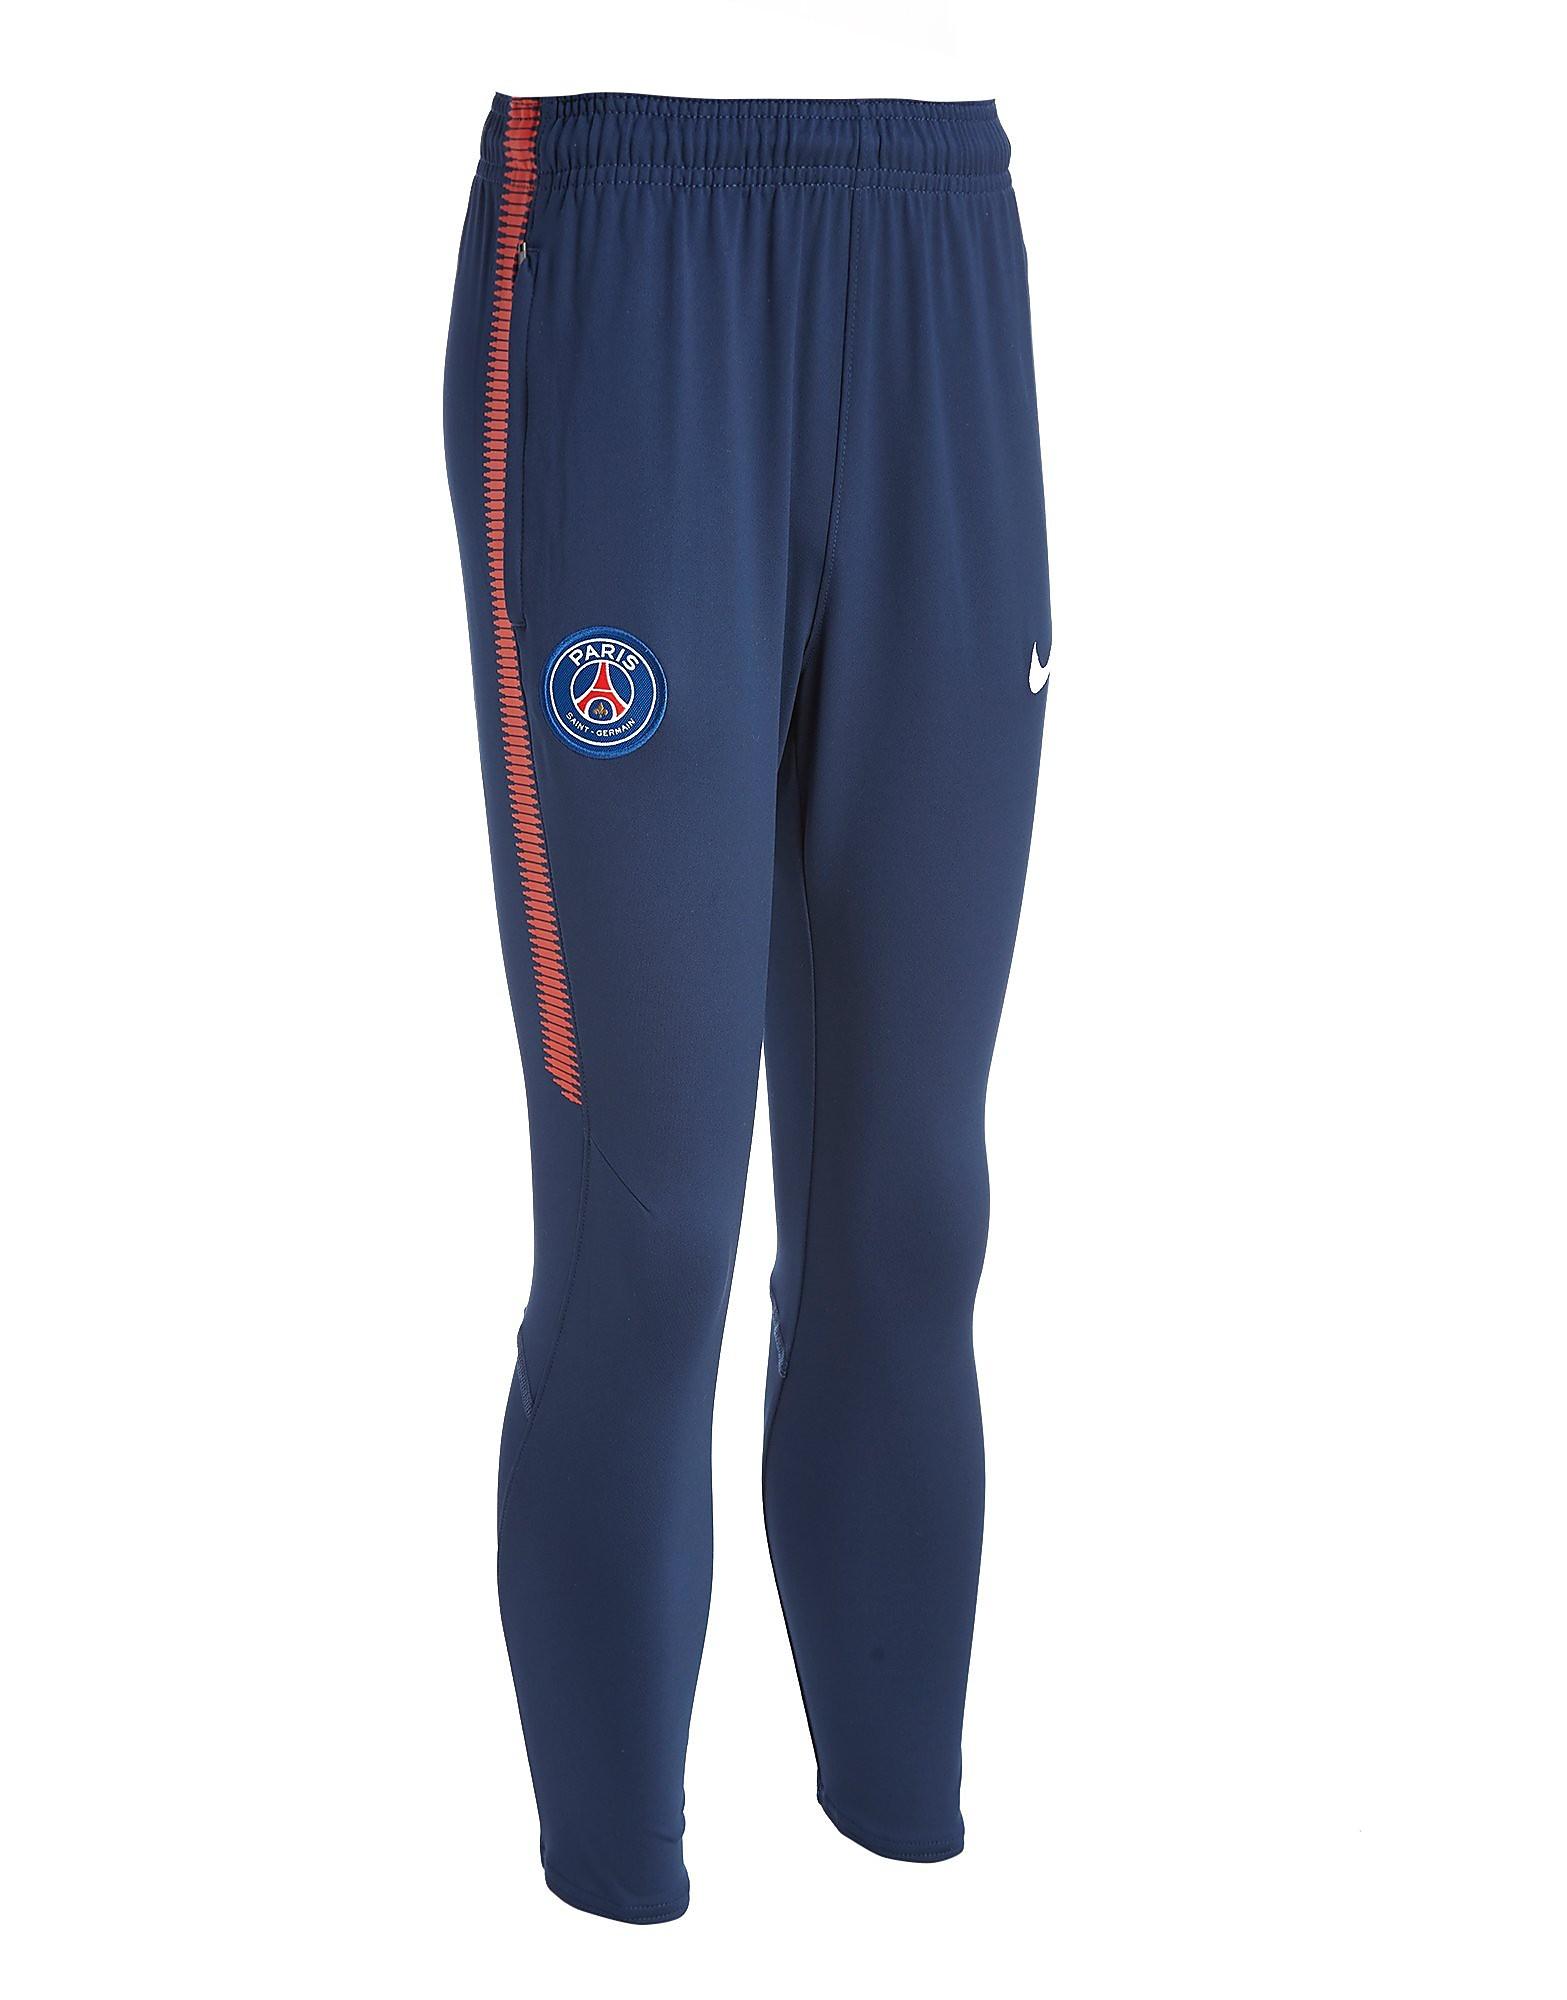 Nike Paris Saint Germain 2017/18 Squad Pants Junior